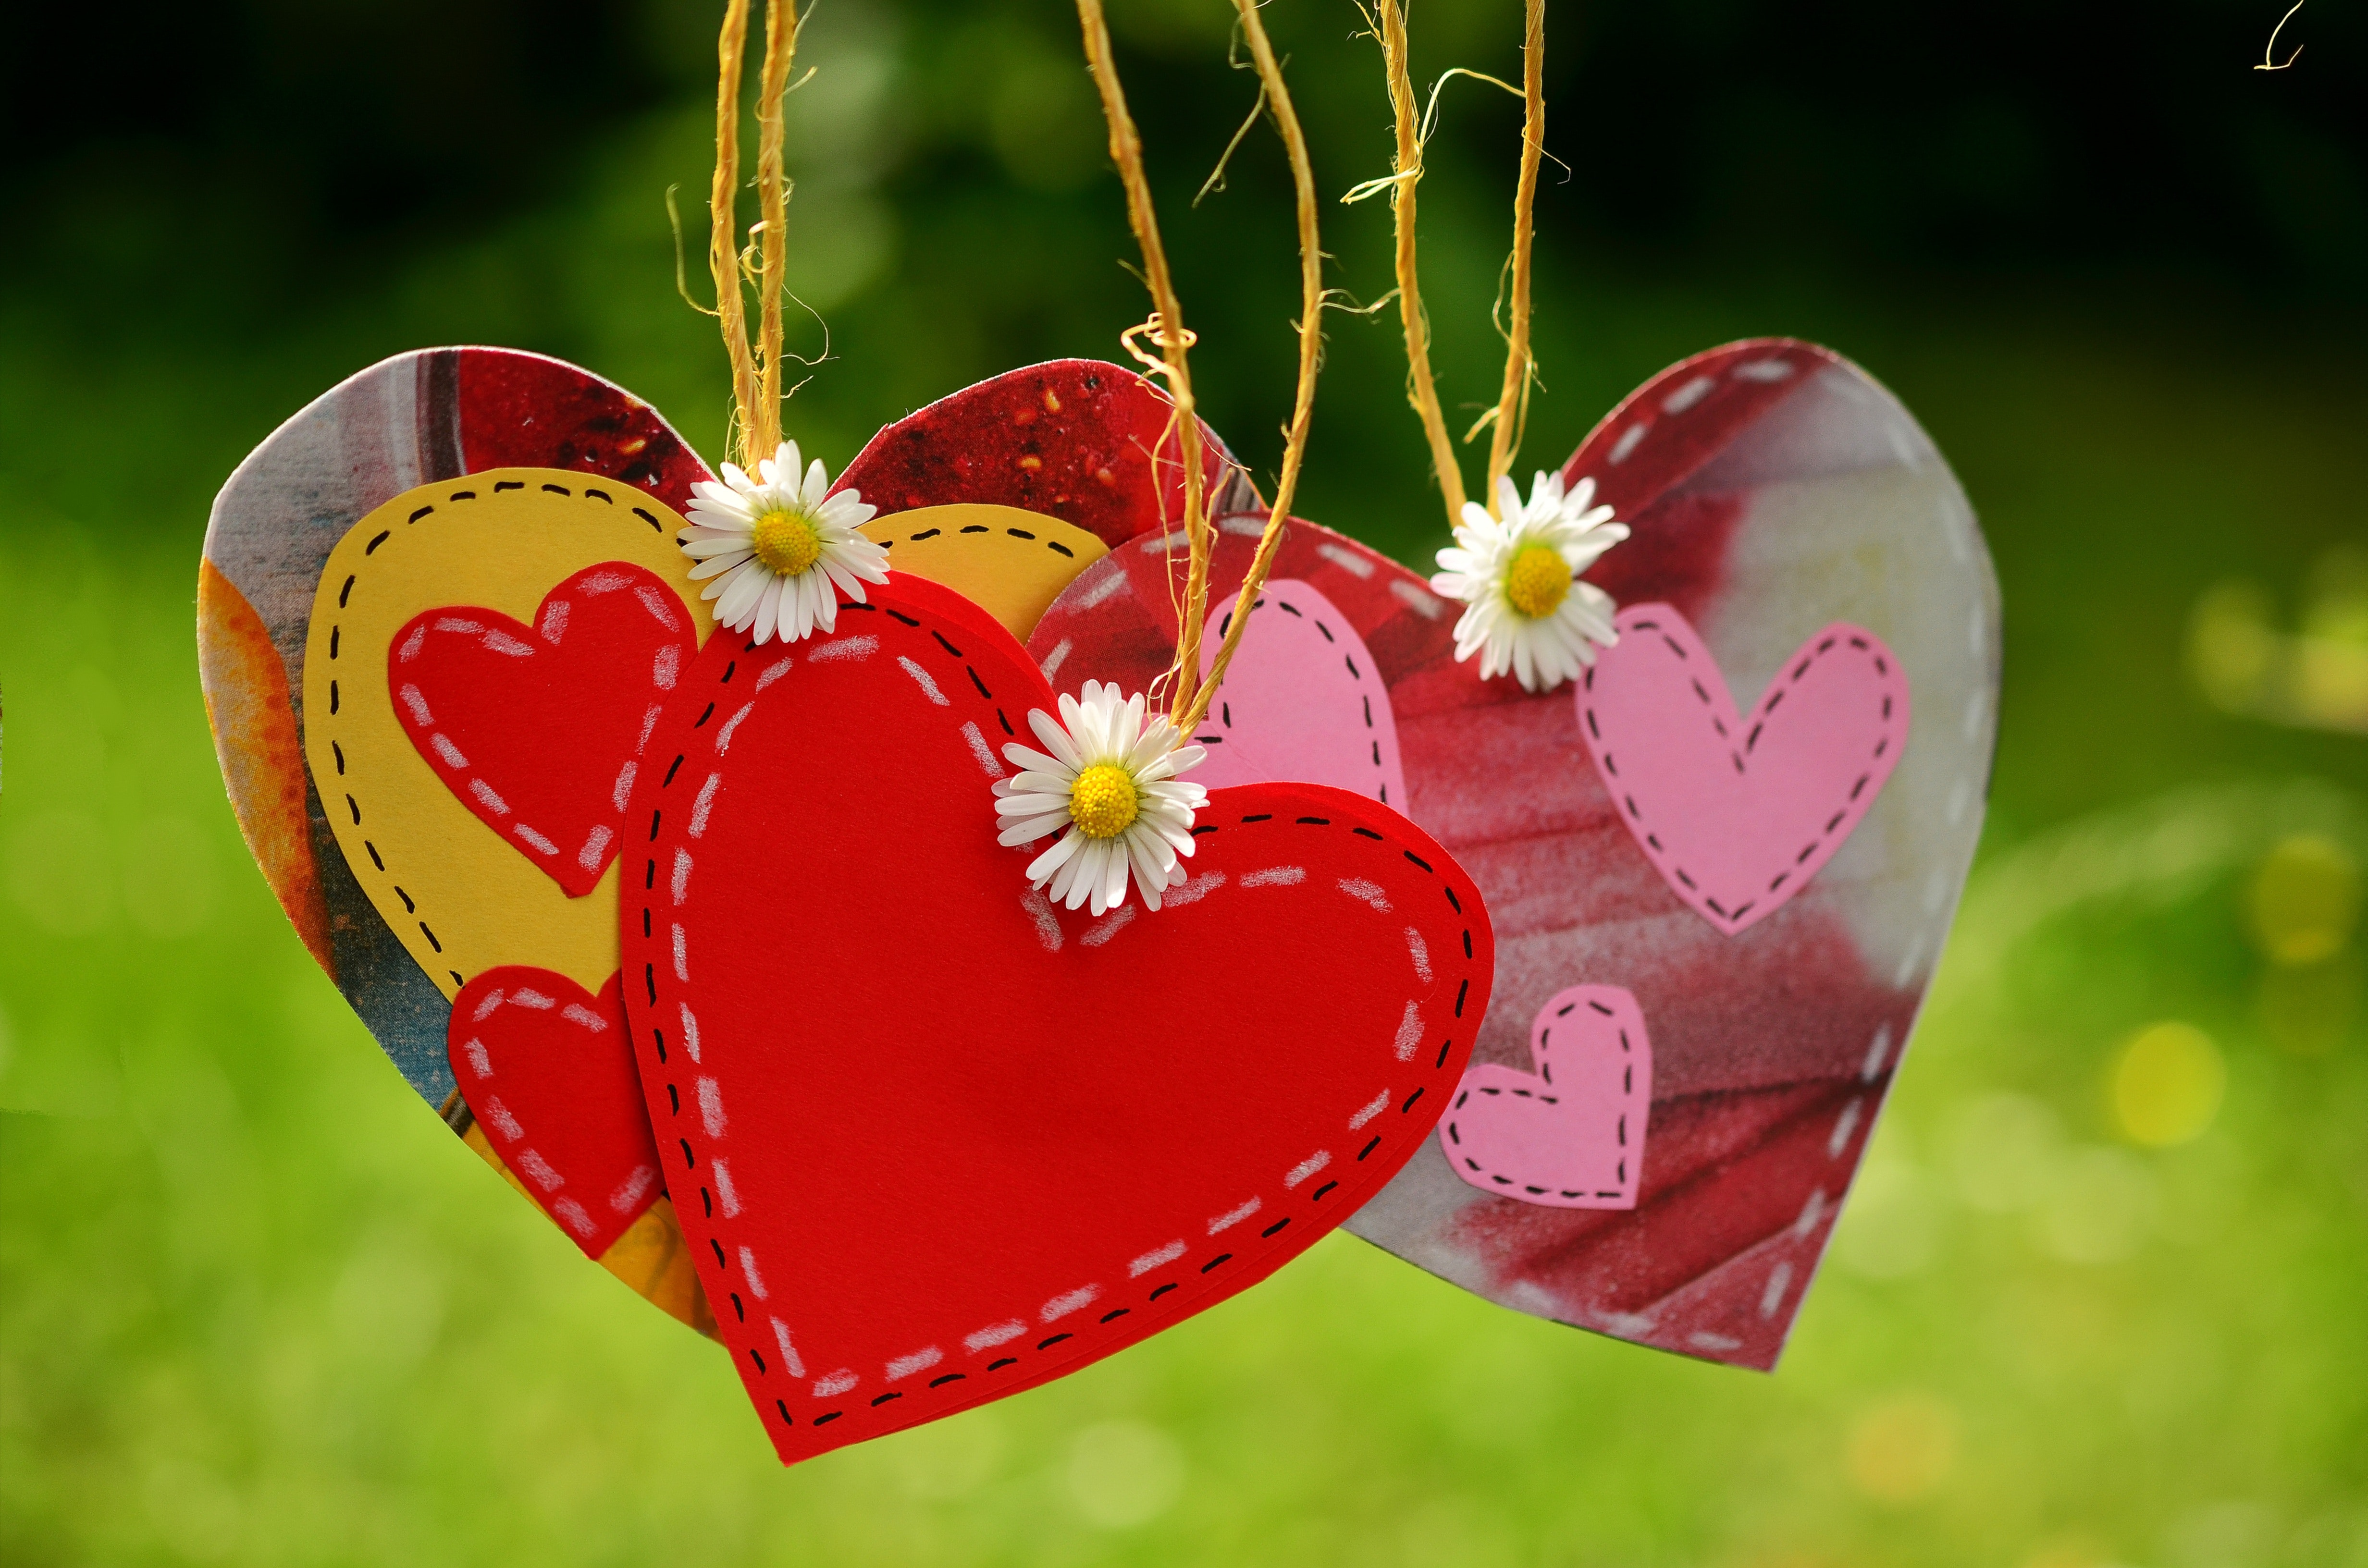 Love Photos Pexels Free Stock Photos